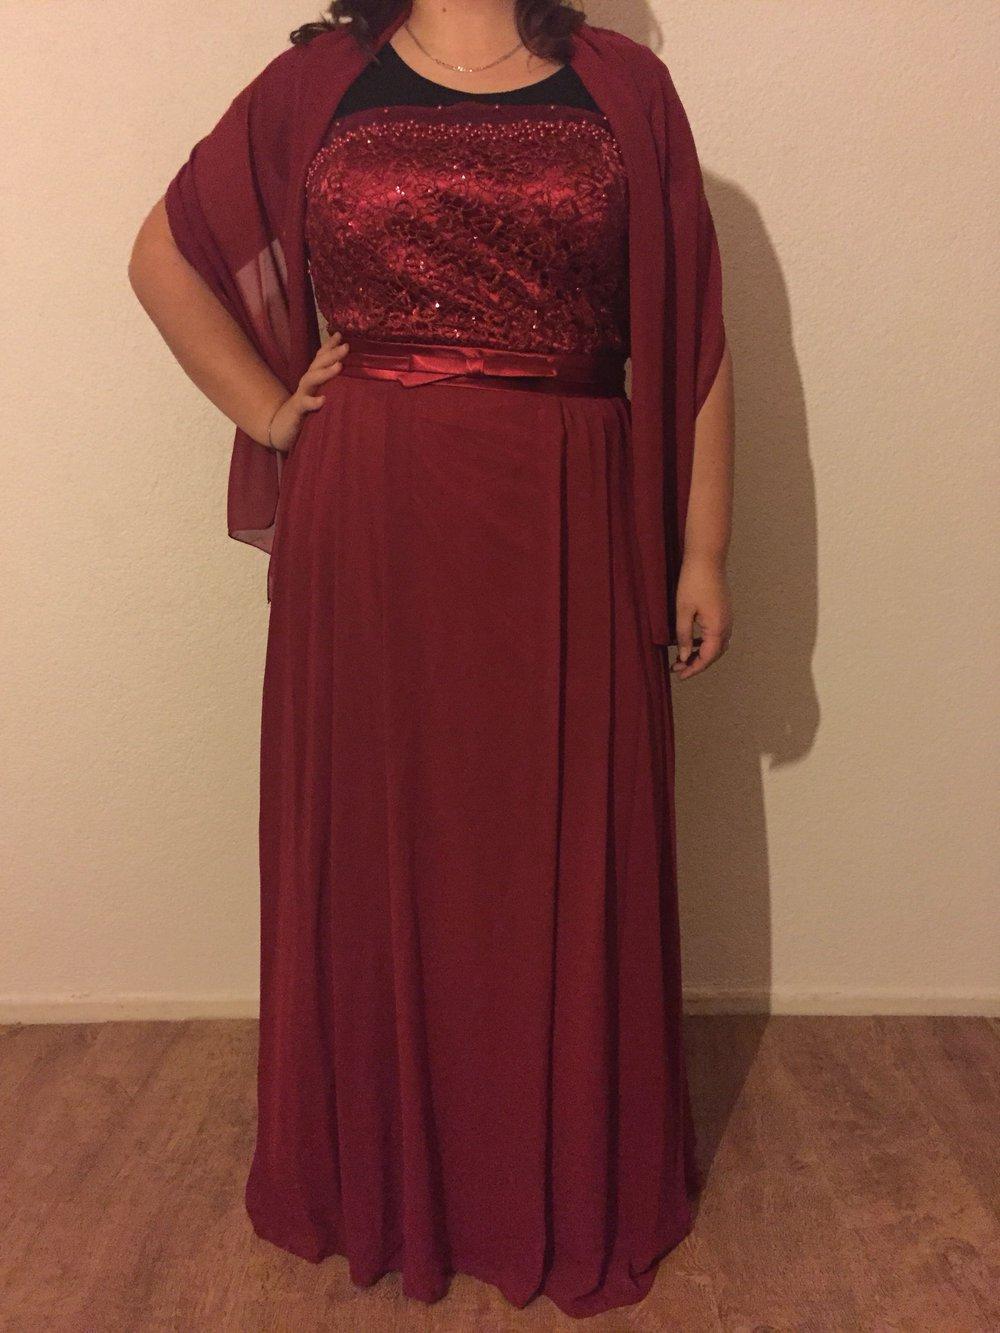 Juju & christin abendkleid gr 19-19 Schnürbar neu weinrot mit Stola und  Silikonträgern abiye elbise